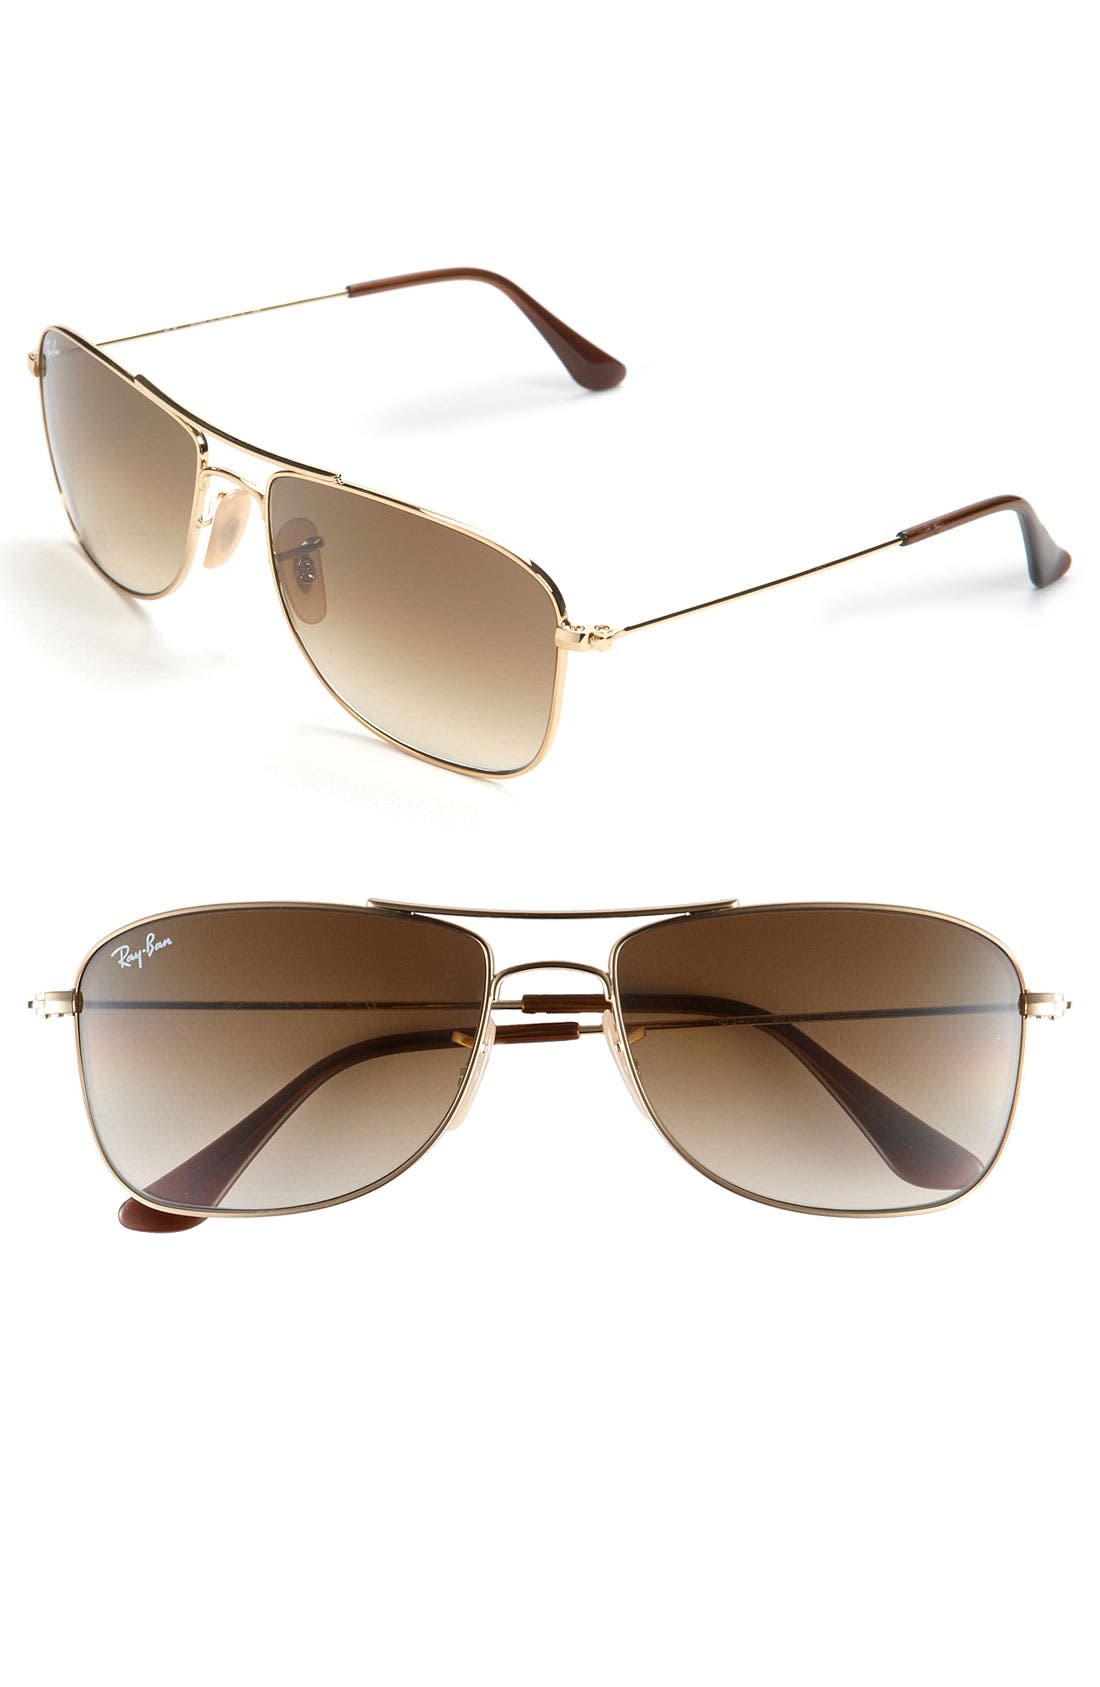 Alternate Image 1 Selected - Ray-Ban 'Square Aviator' 56mm Sunglasses